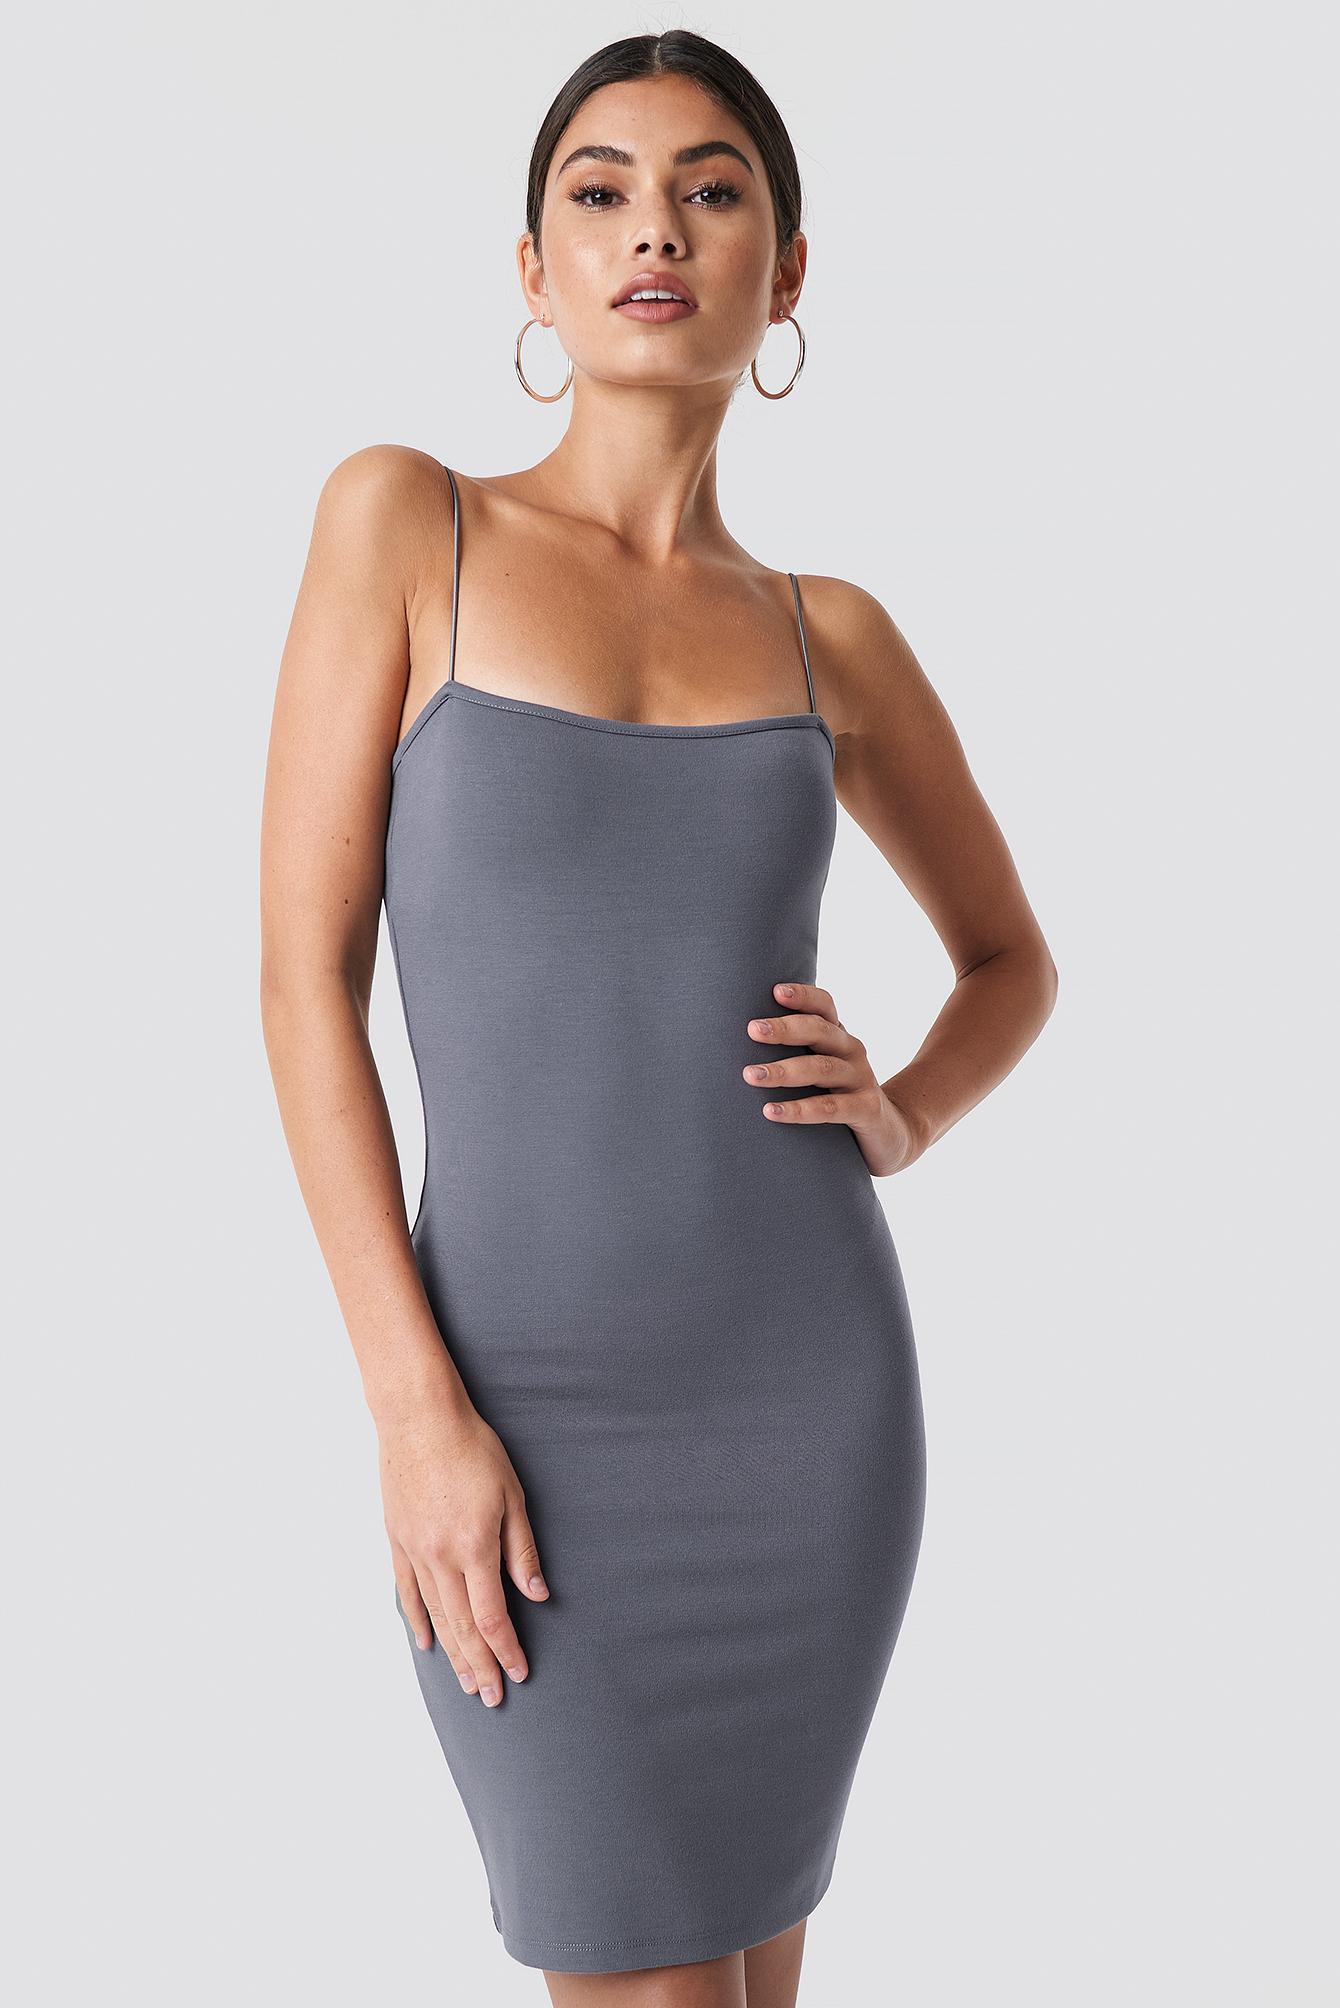 NICKIXNAKD Bodycon Spaghetti Strap Dress - Grey